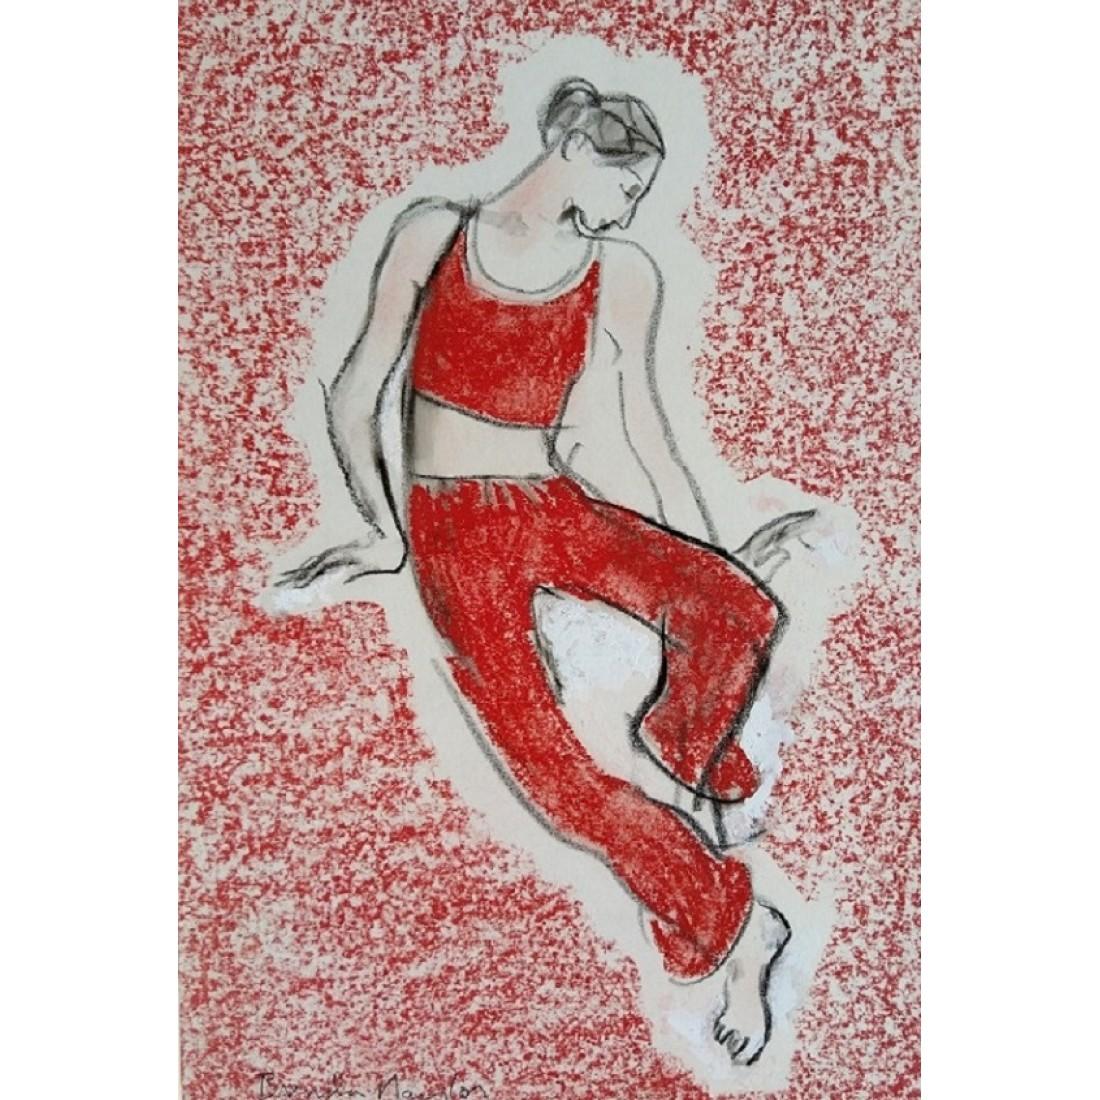 207 Shobana Jeyasingh Dance Company